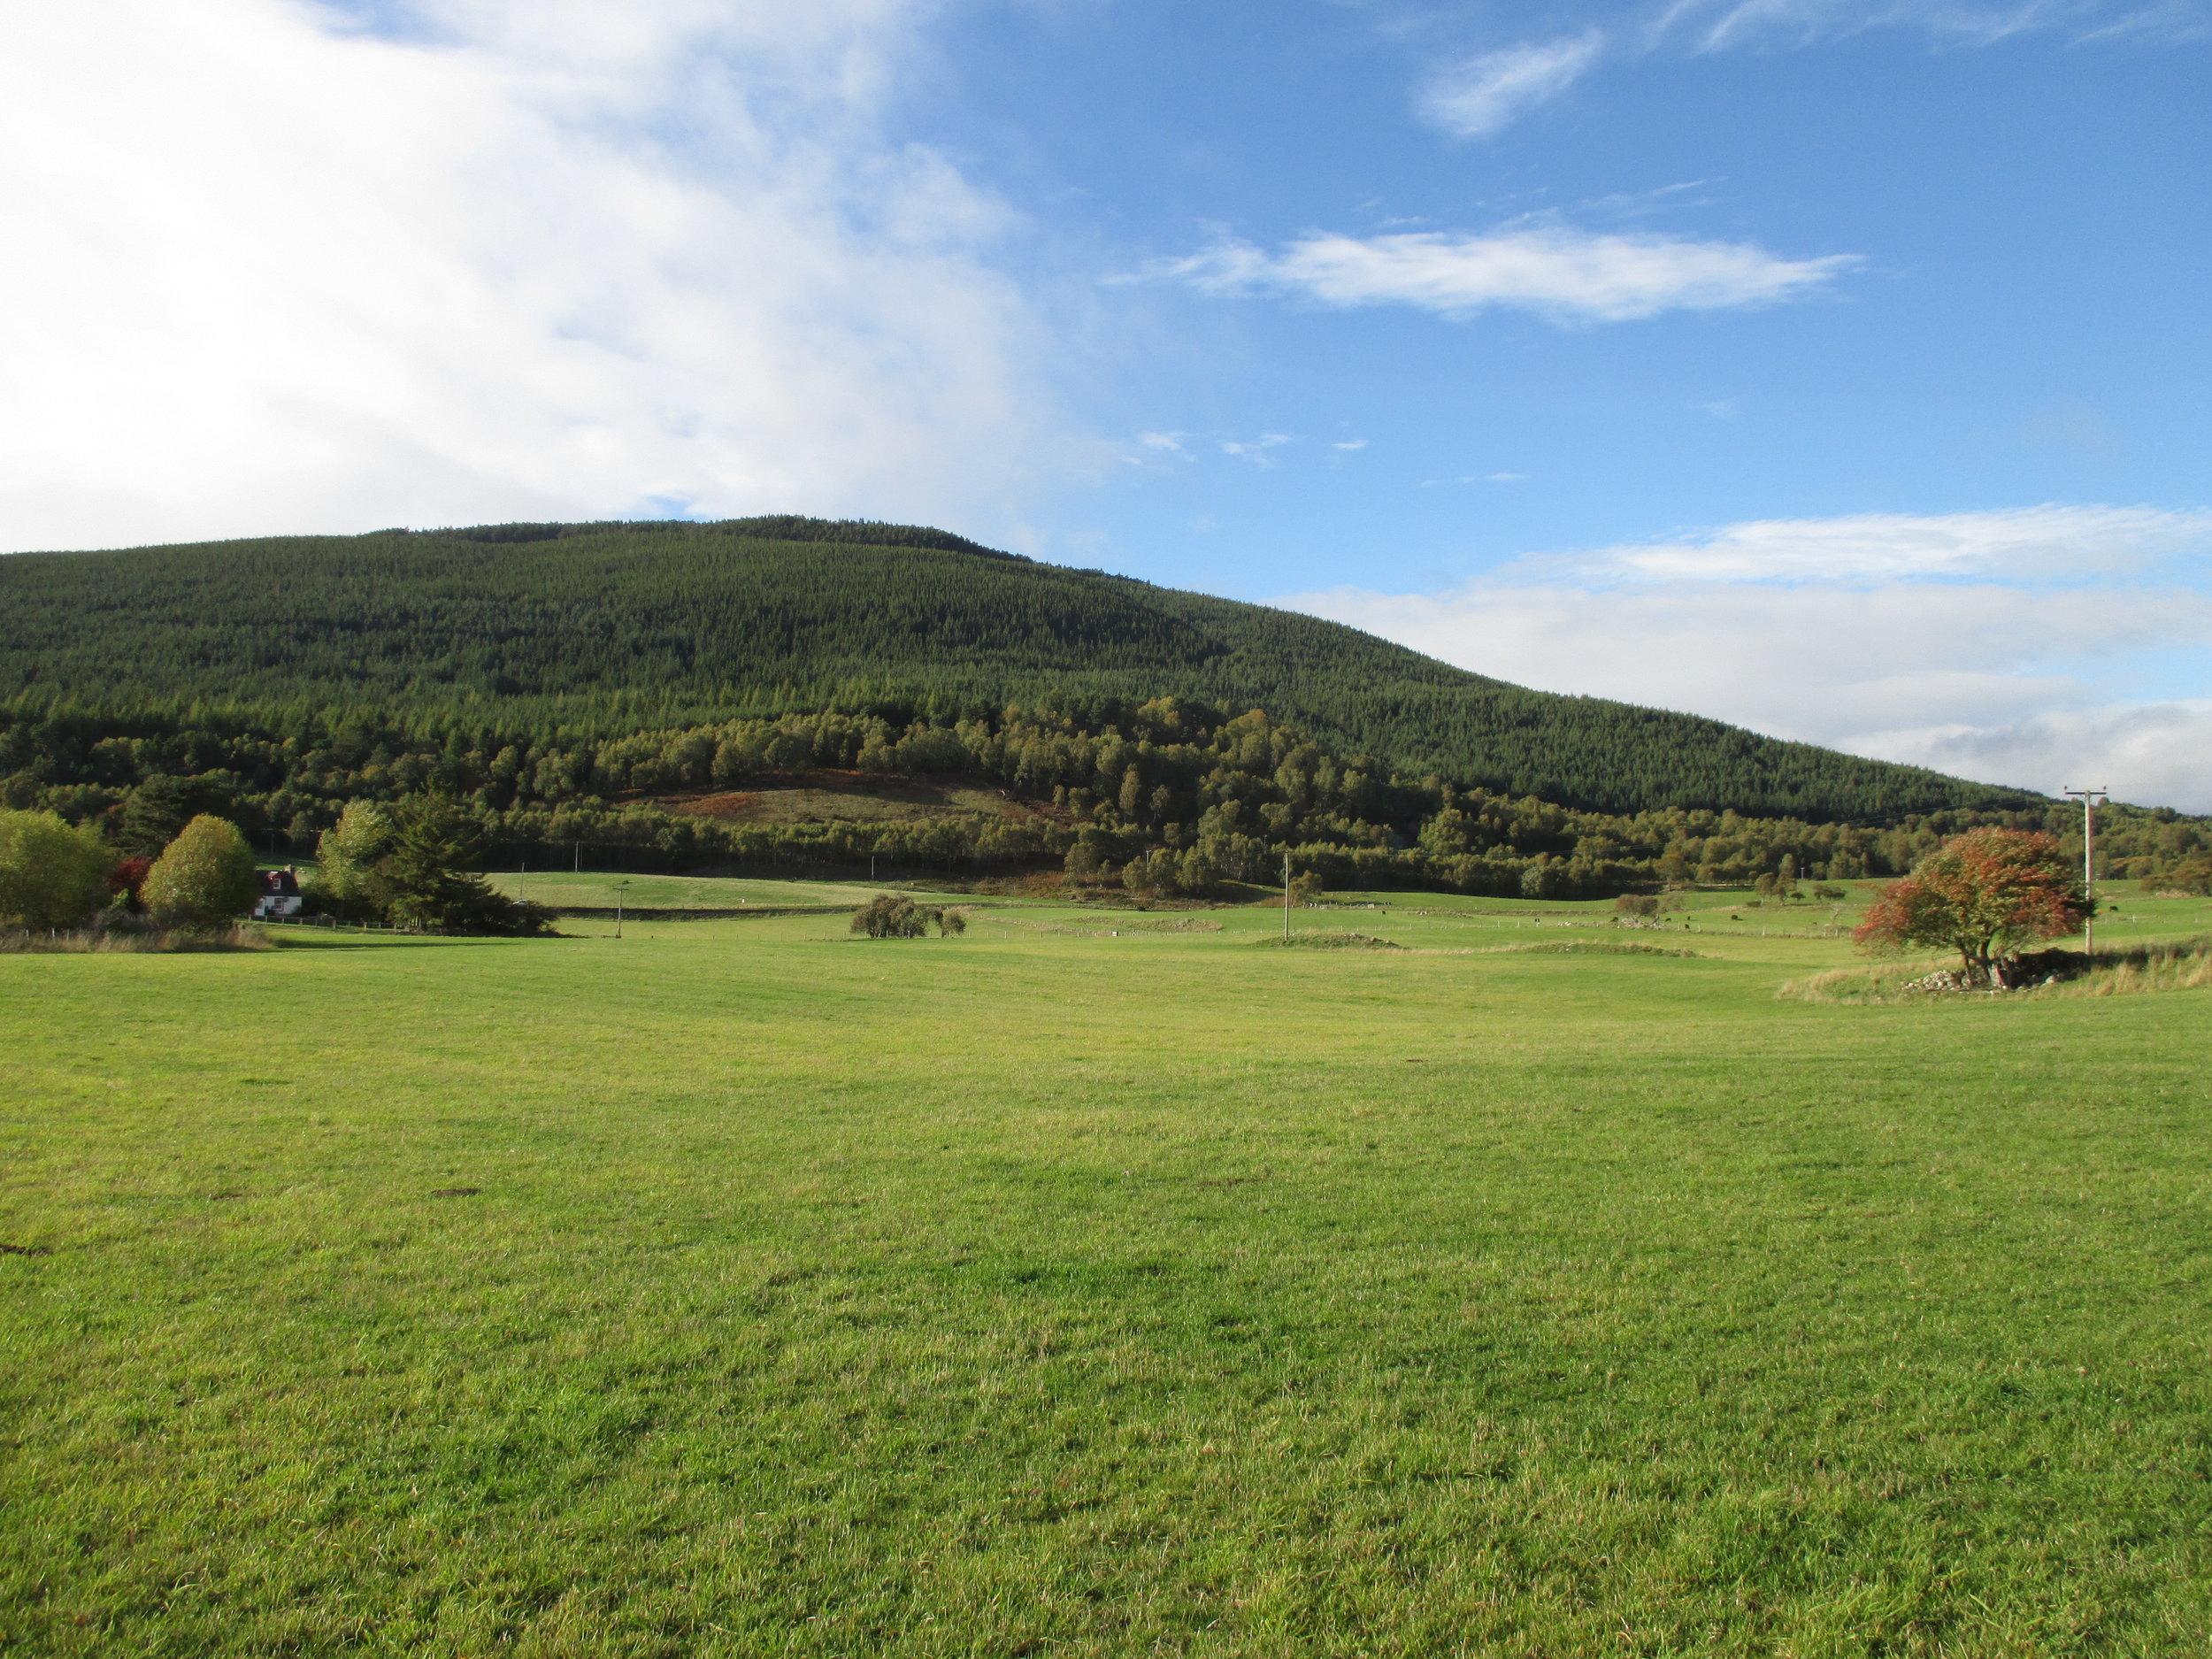 The field near the hidden stone circle, Scotland 2018